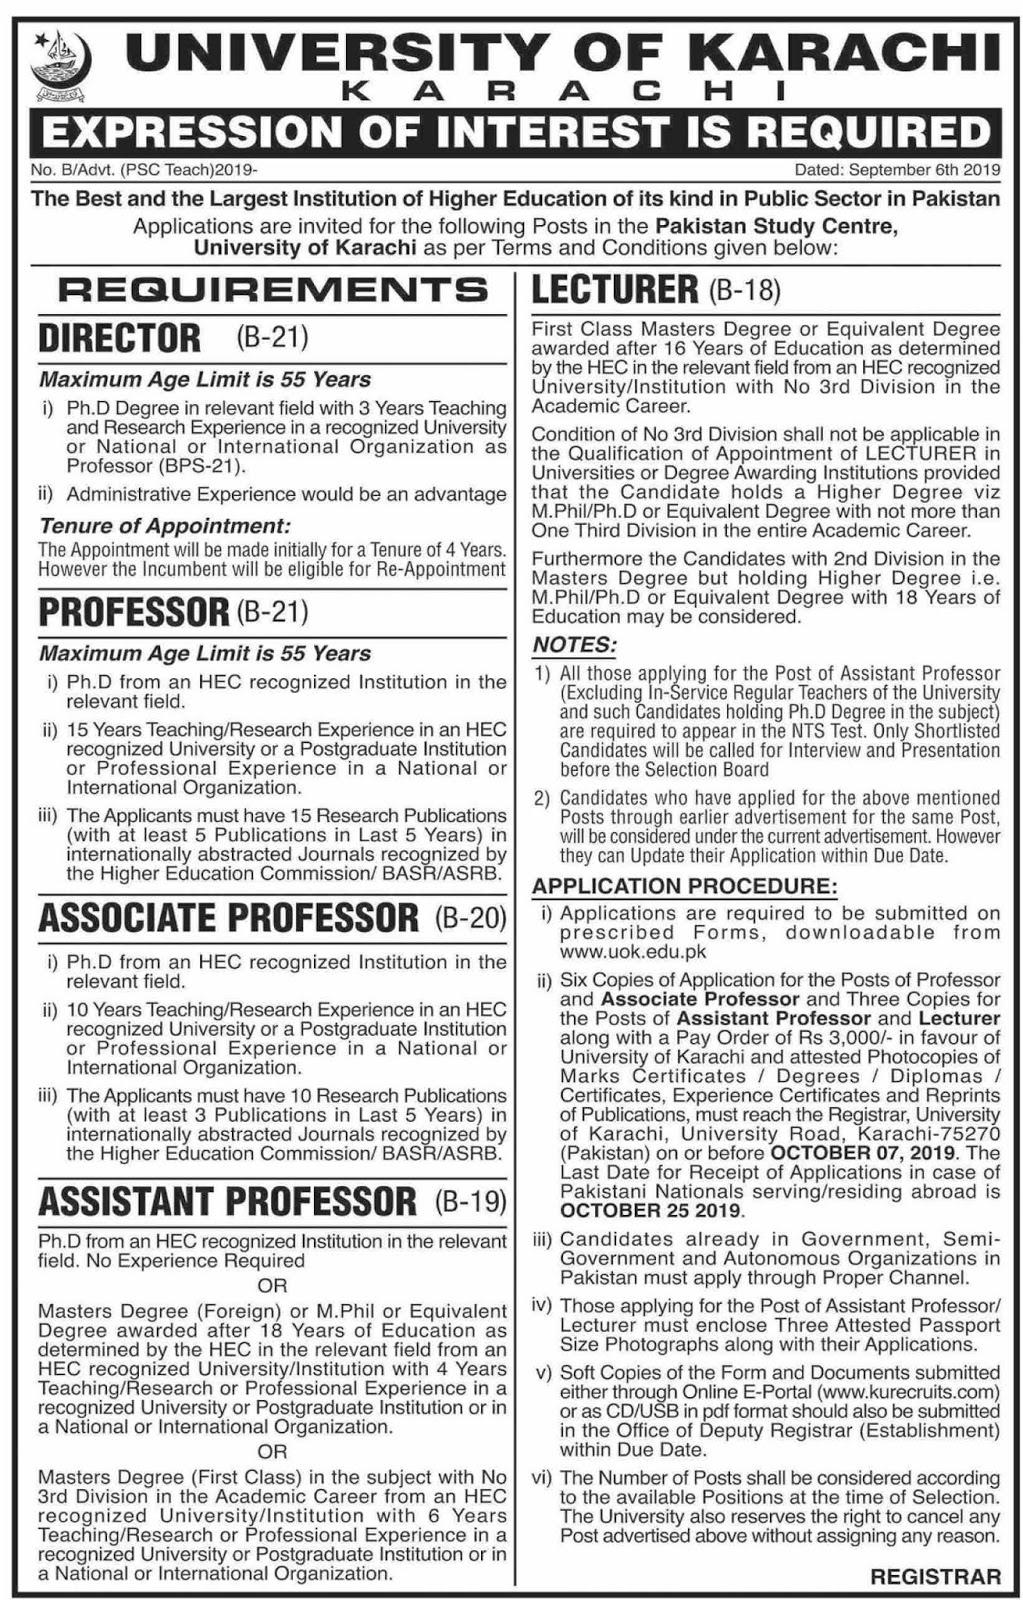 Latest Jobs in University of Karachi Sep 2019